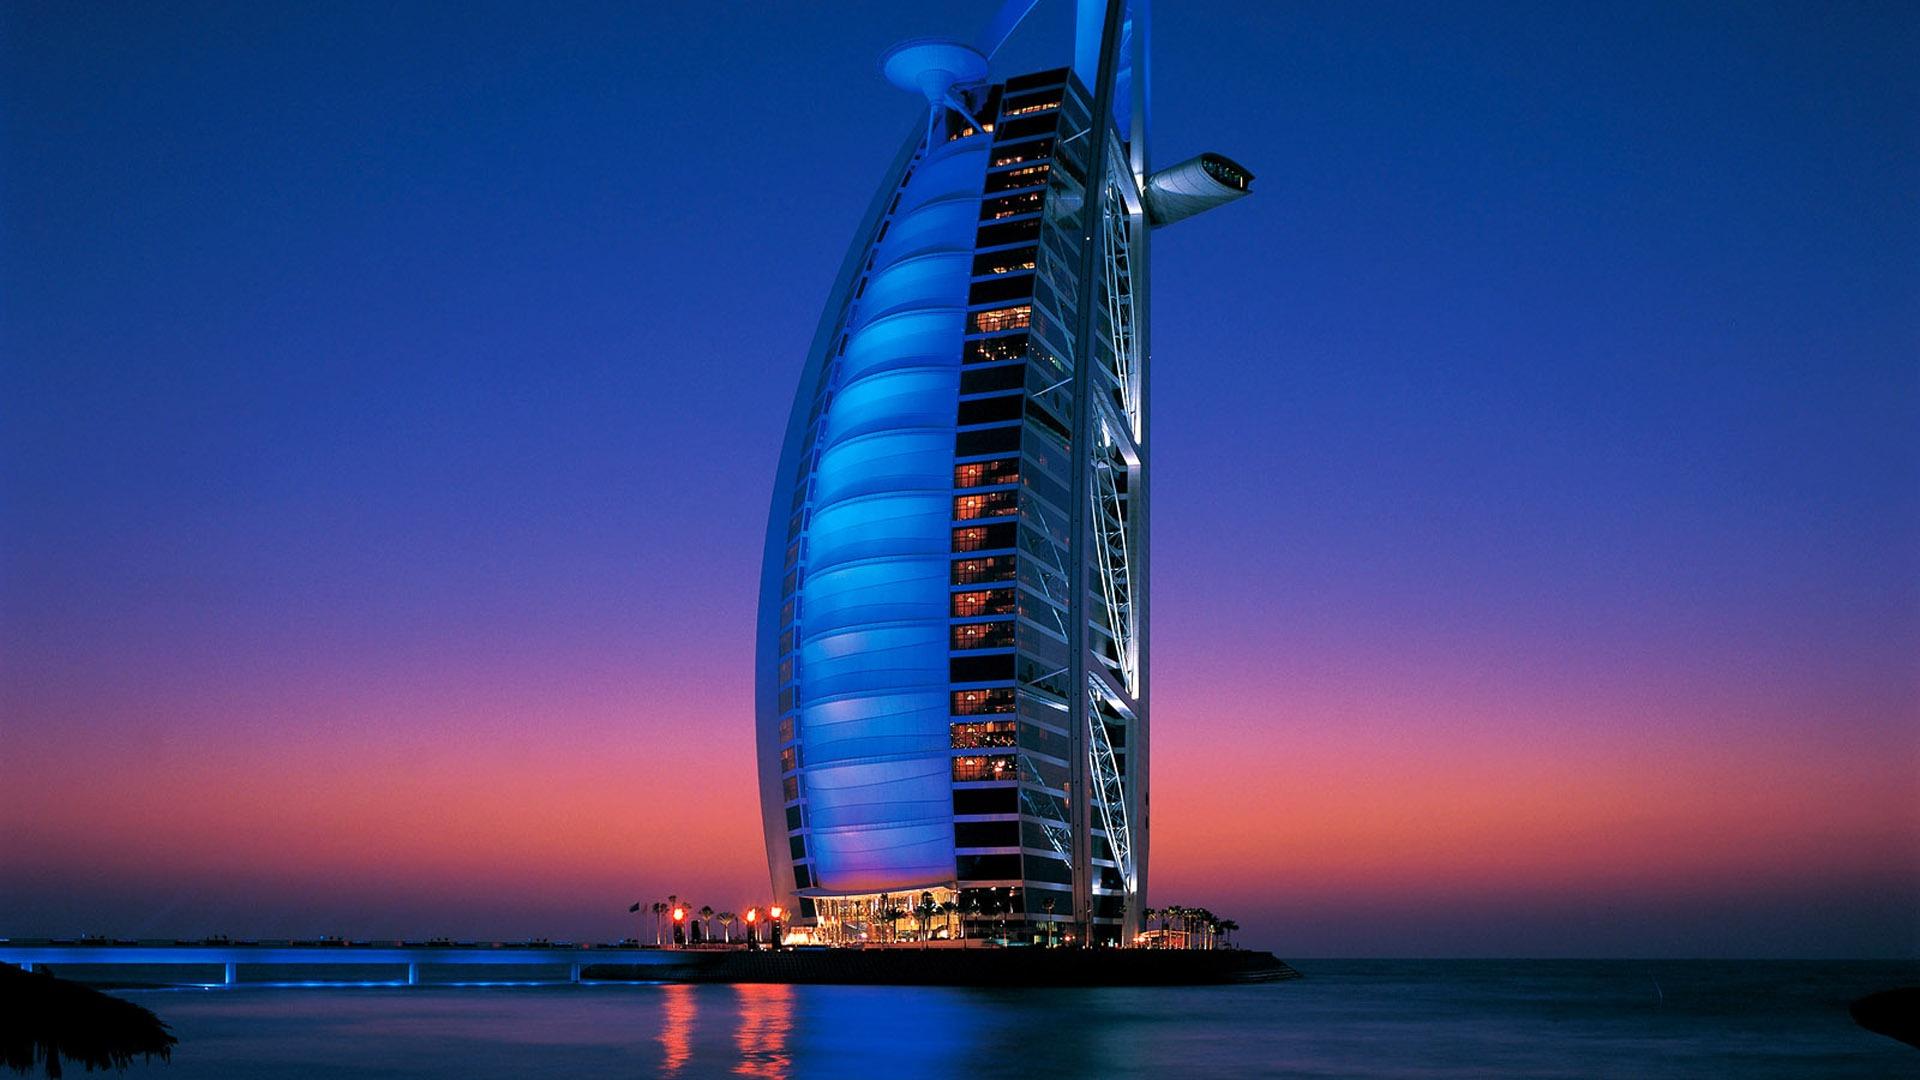 Burj Al Arab Hotel In Dubai At Night Preview 10wallpaper Com